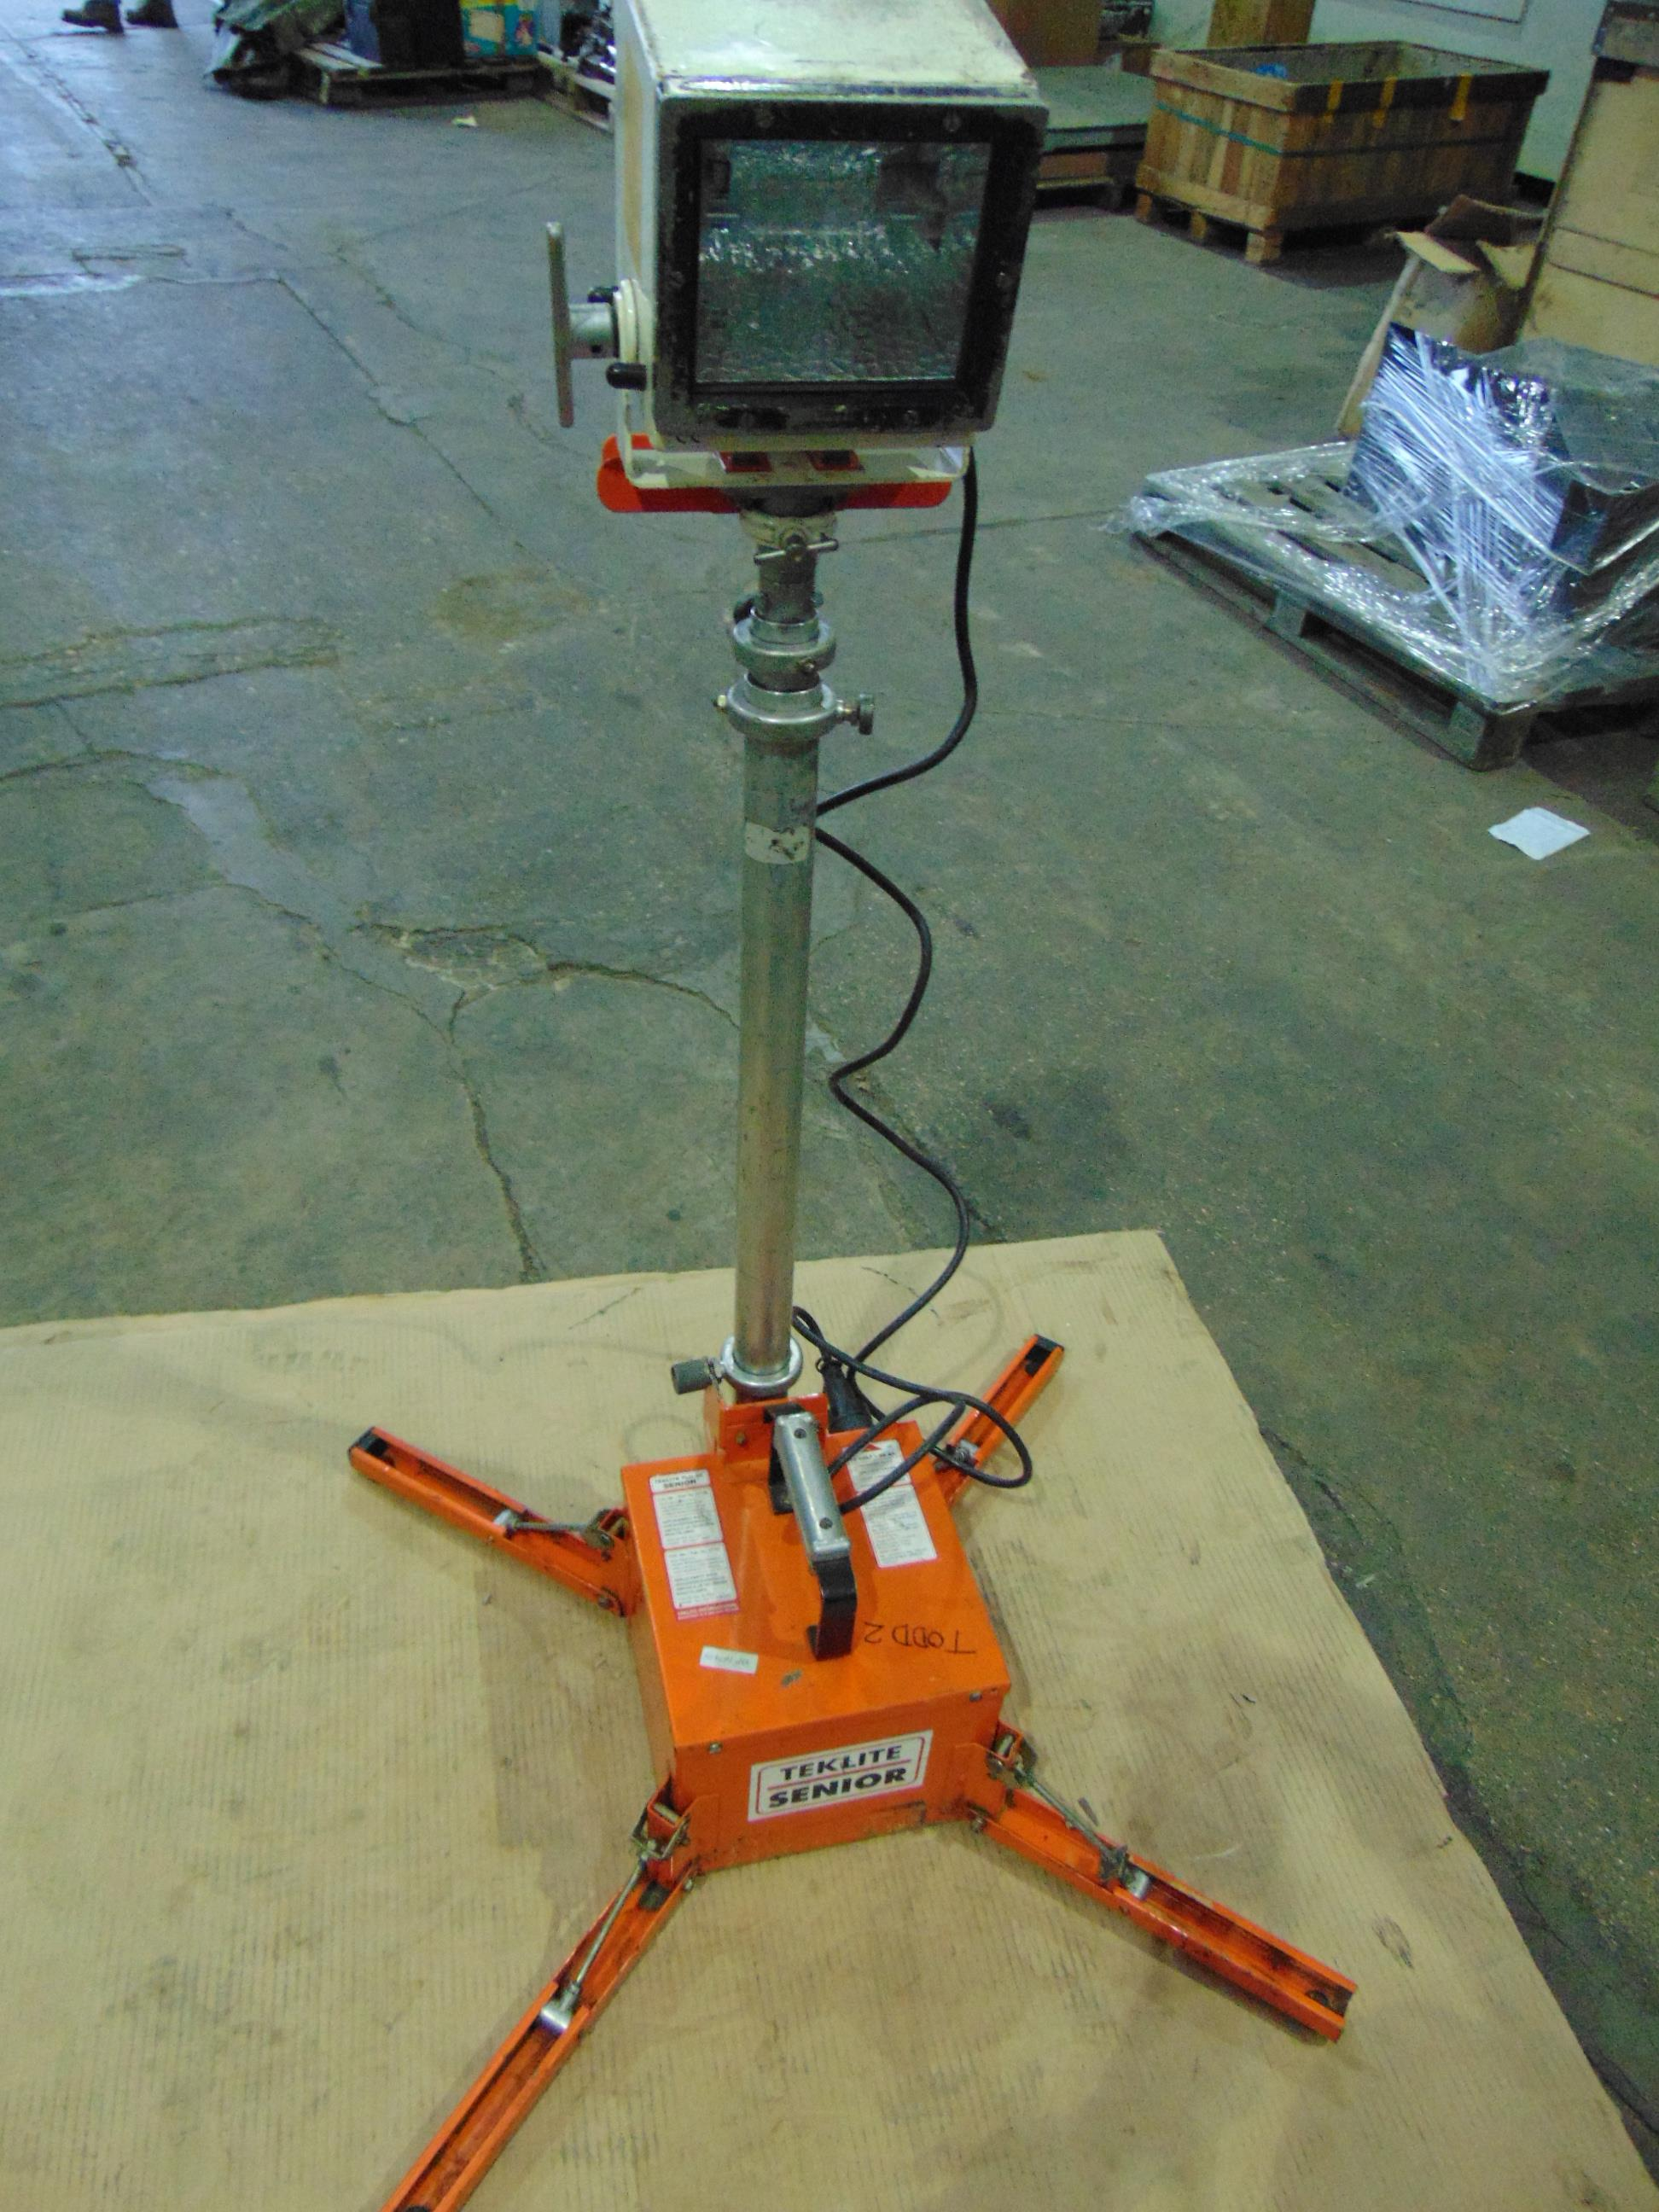 Lotto 26430 - Teklite 5K-B2 Portable Worklight with Teklite Senior Battery and Mast